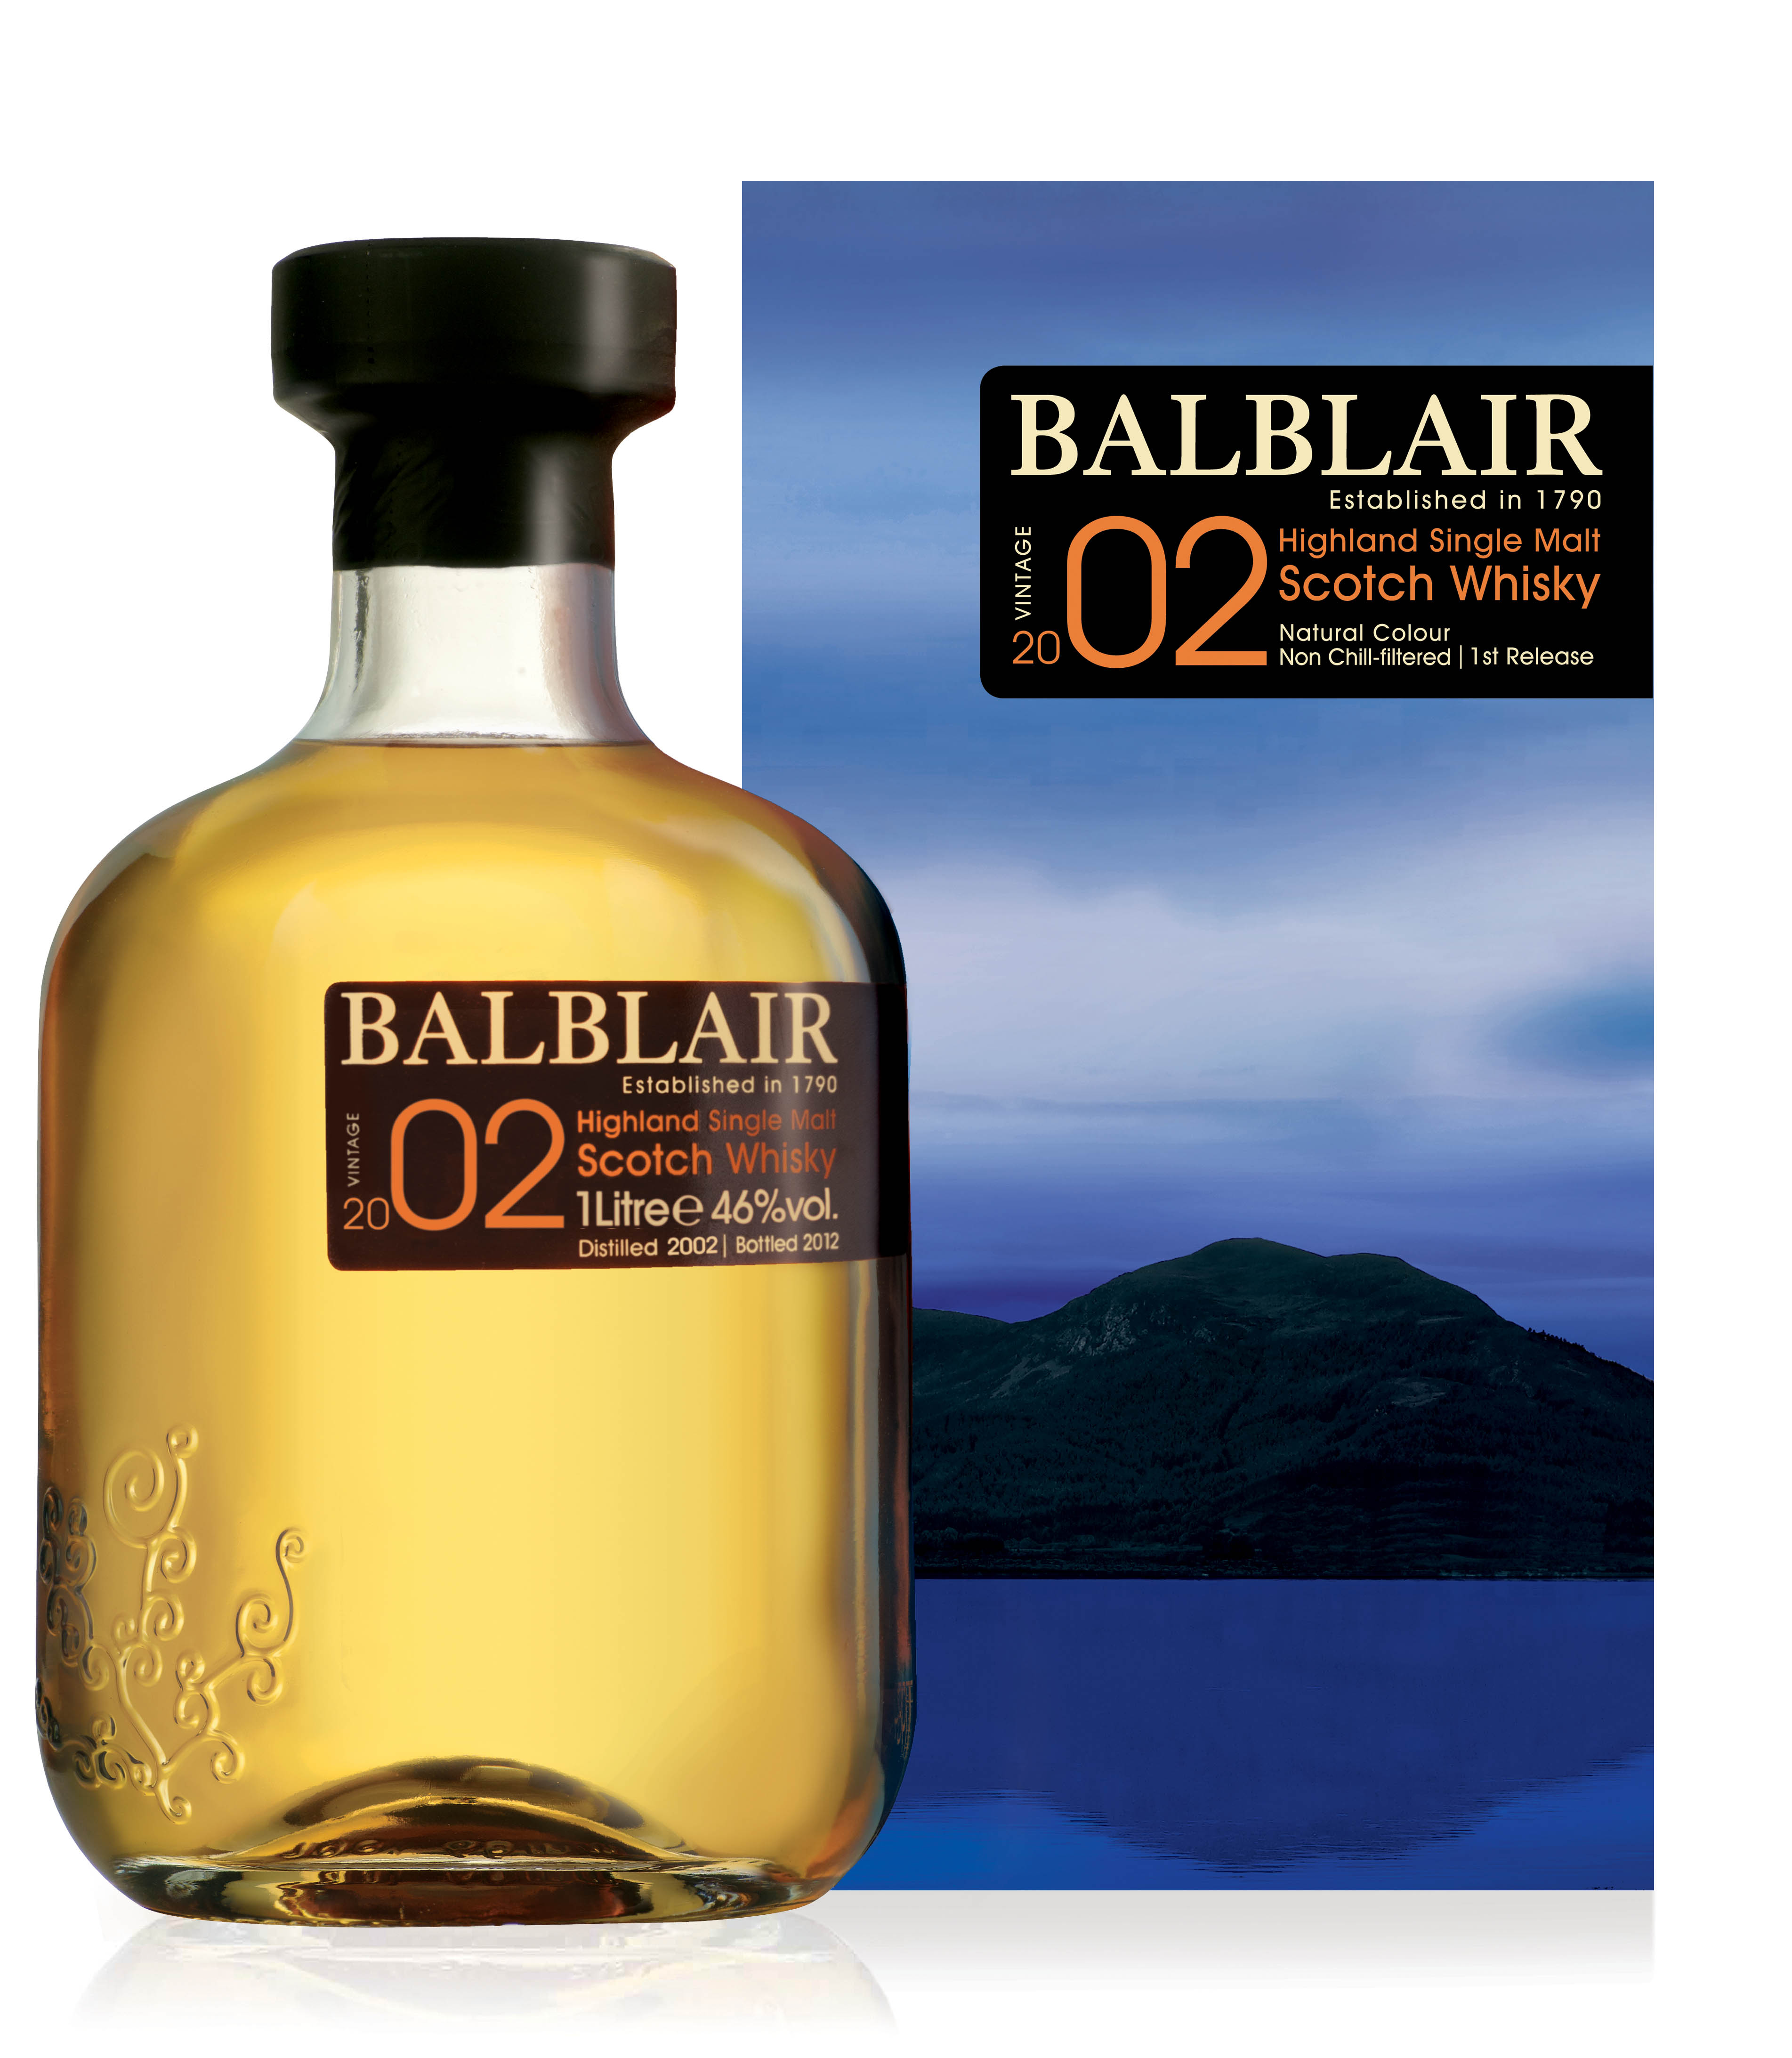 Balblair 2002 - 900 гривен